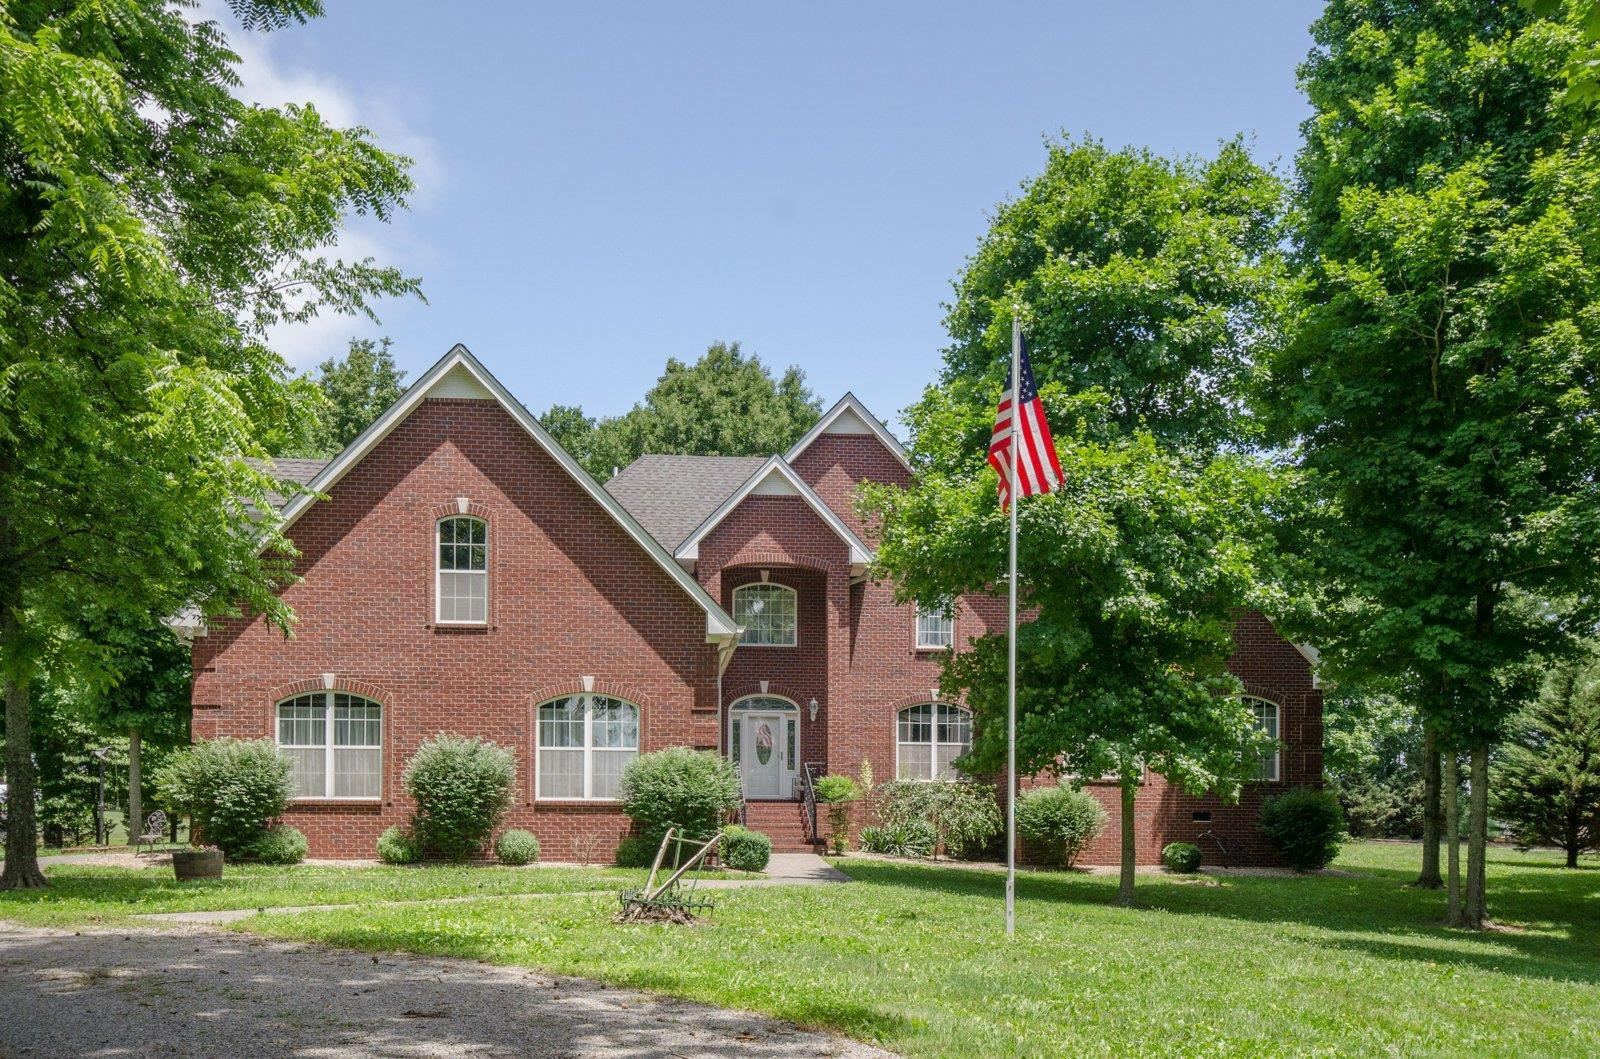 Custom Brick Home On 2.27 Acres With Peaceful Outdoor Living Area!  8330 Guthrie Rd, Cross Plains, TN, 37049